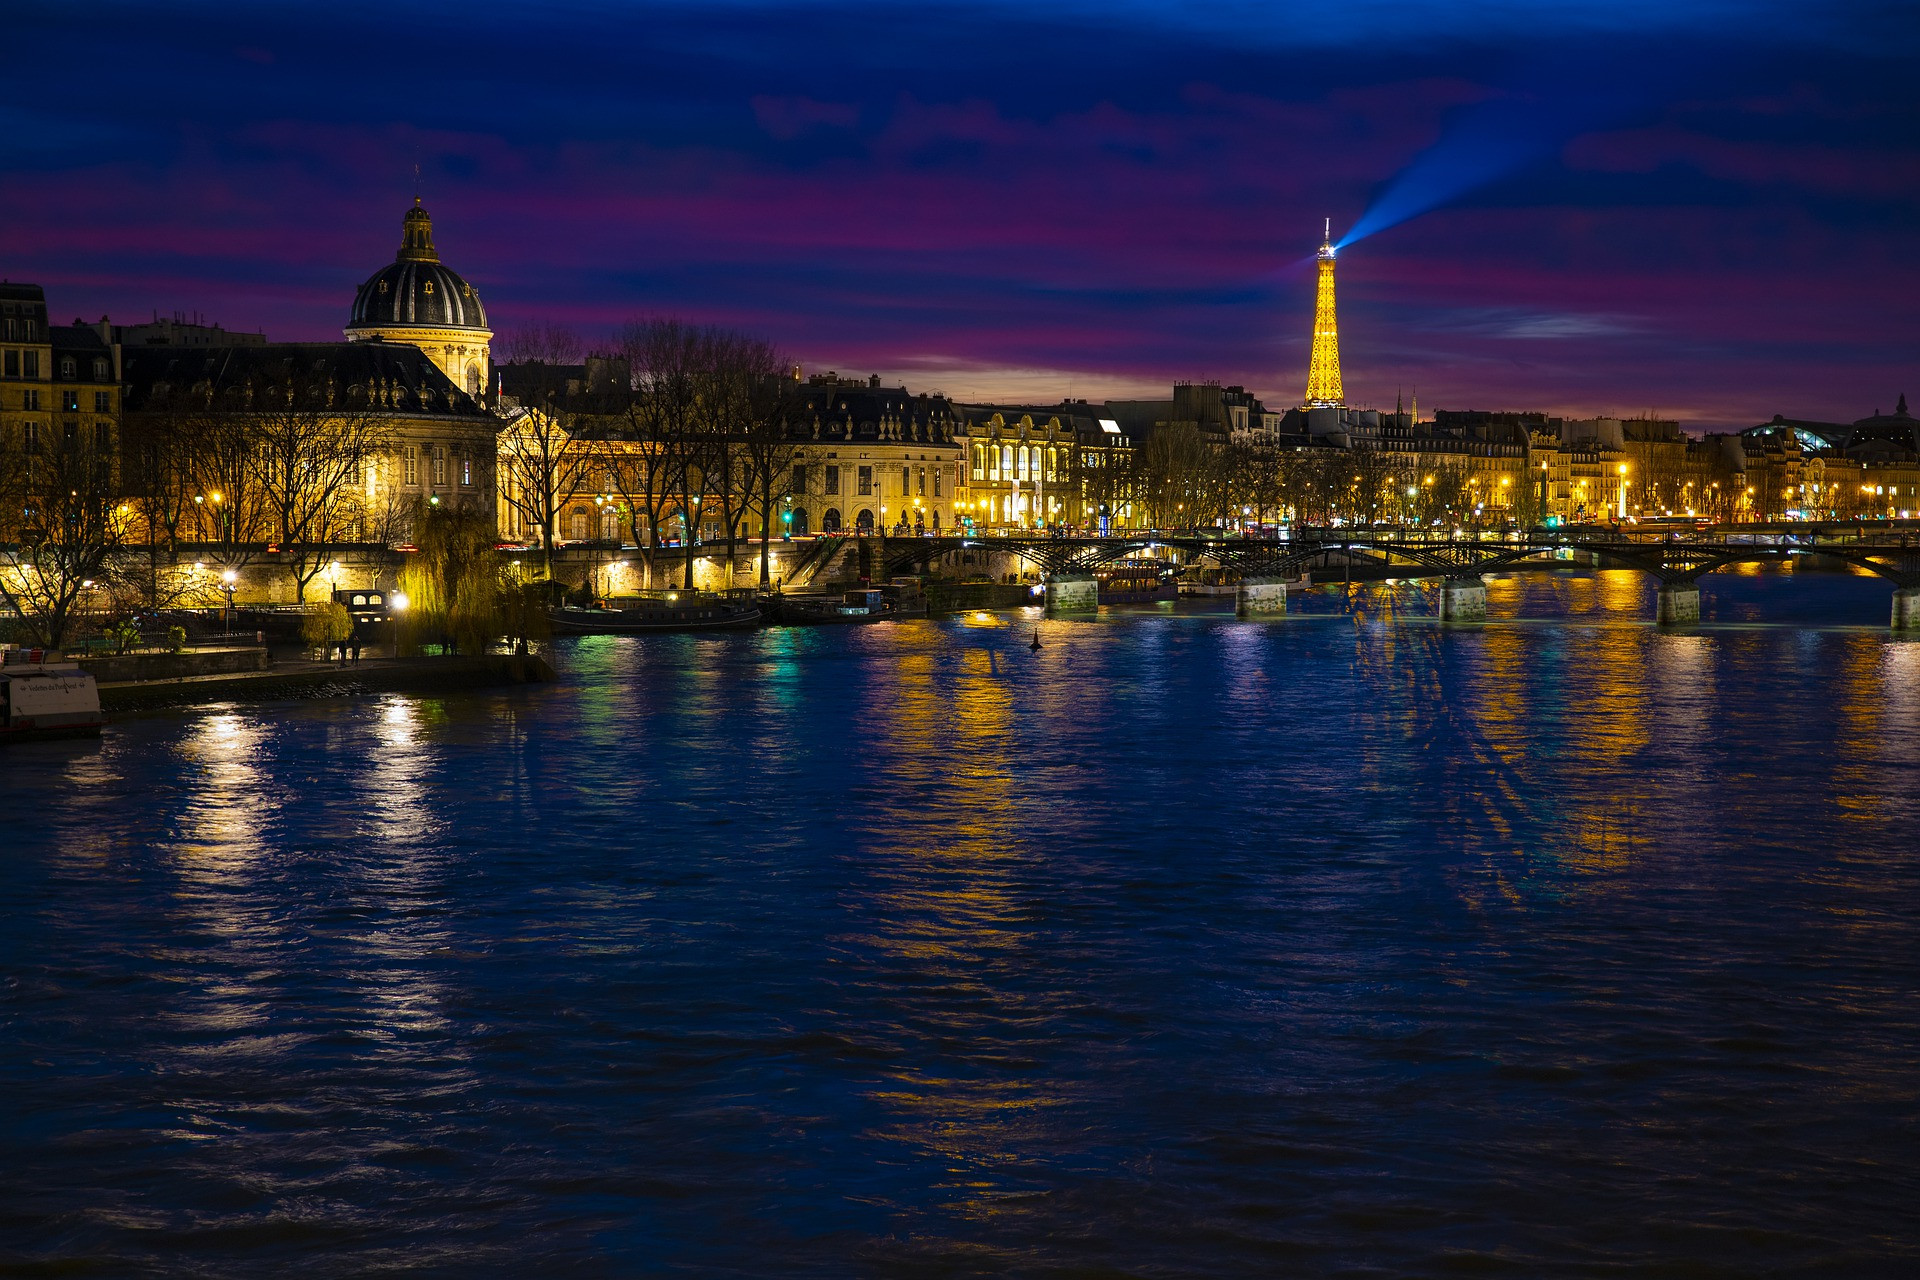 Paris, France (Day & Night)